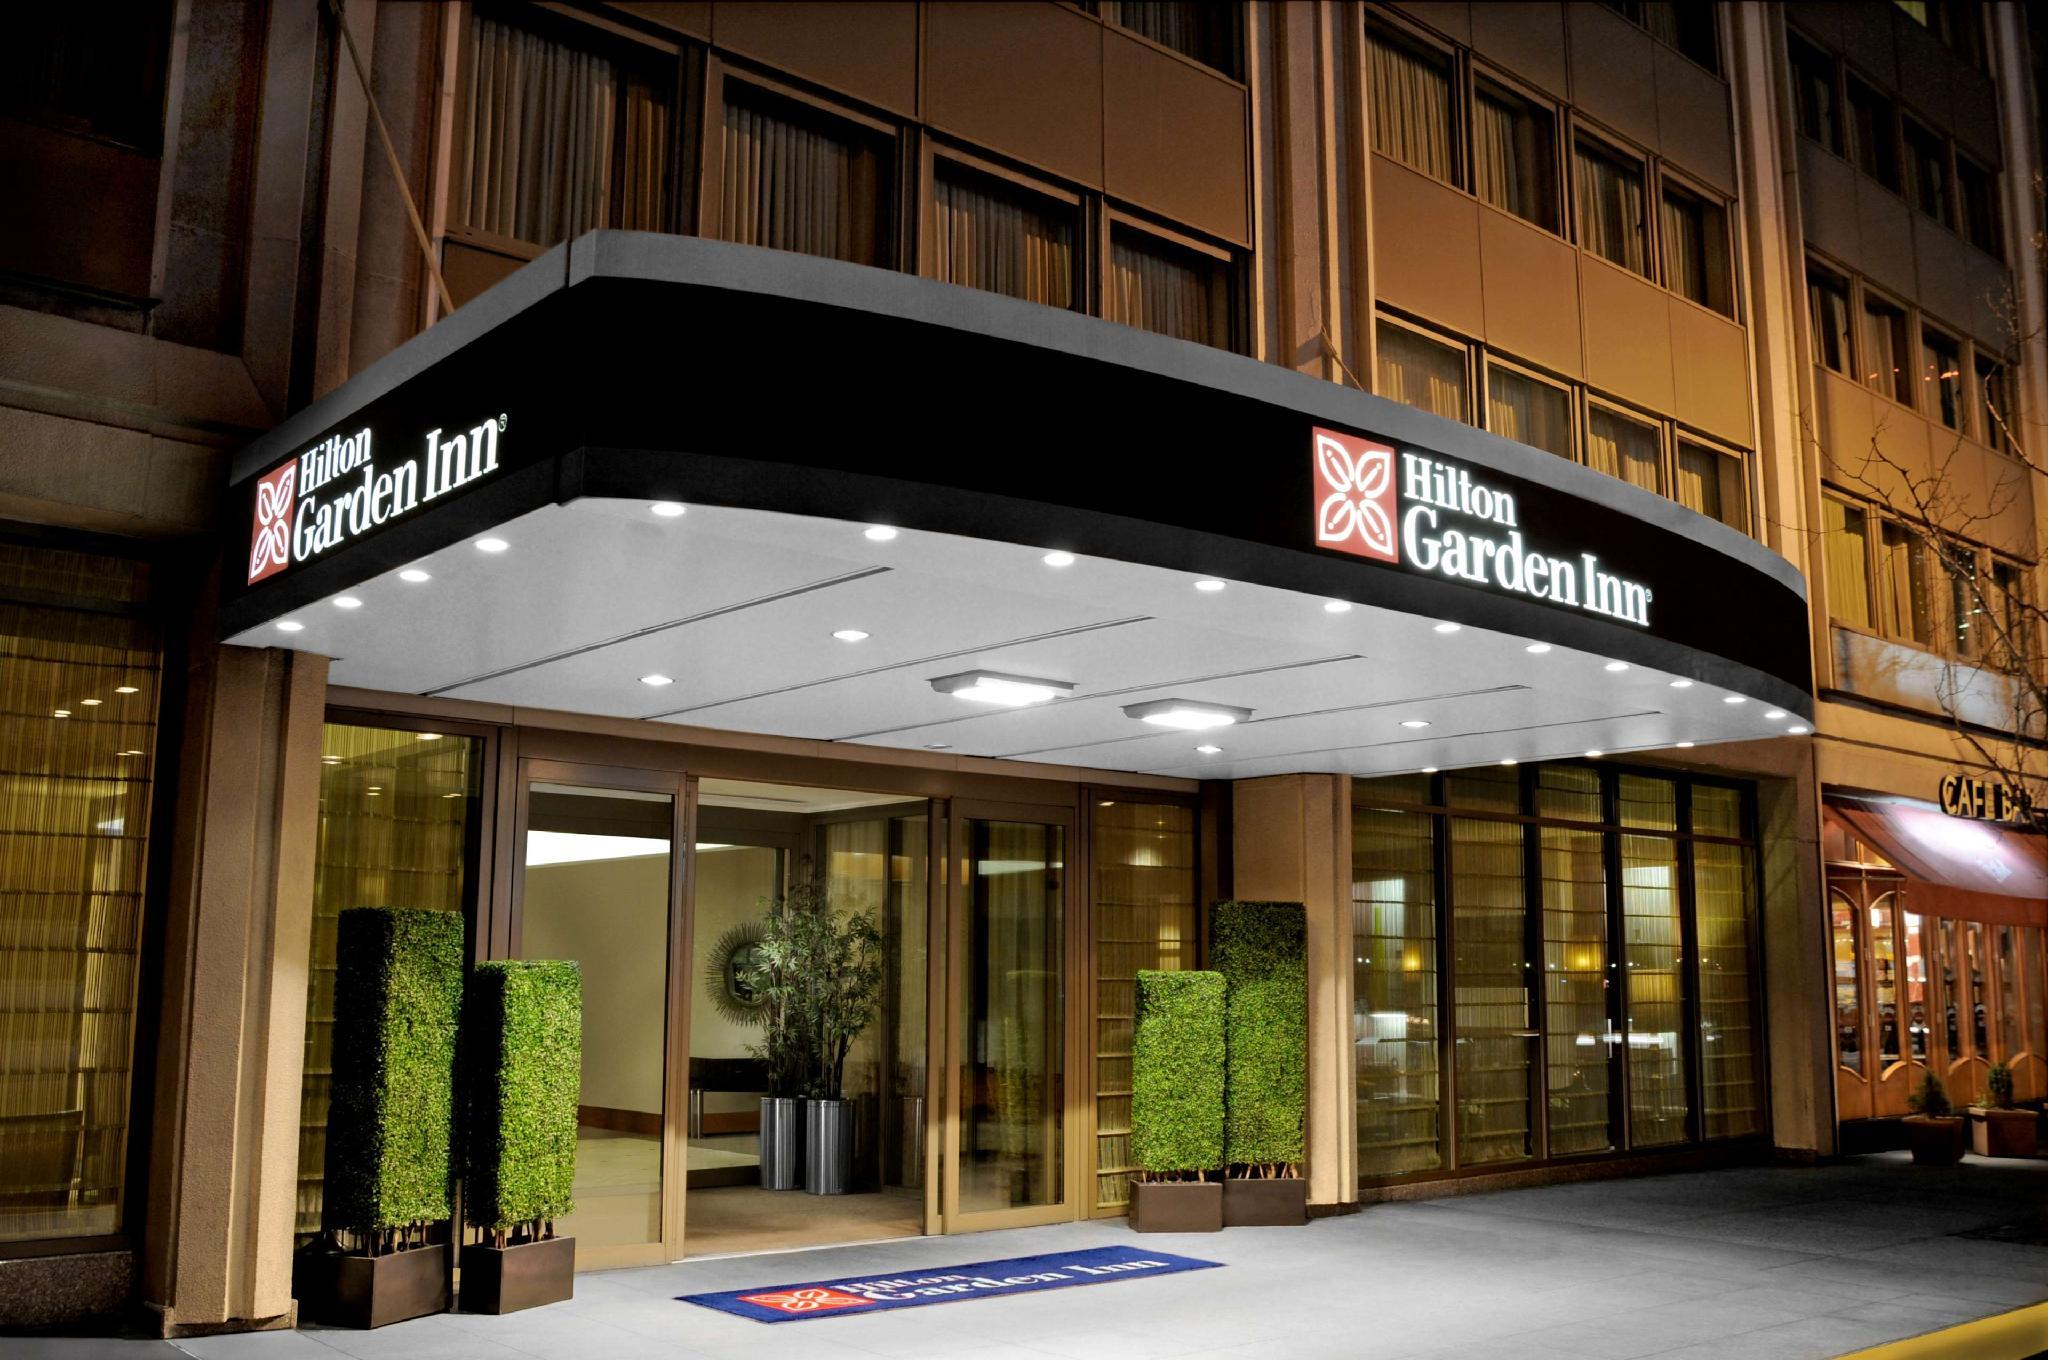 Hilton Garden Inn Times Square Hotel image